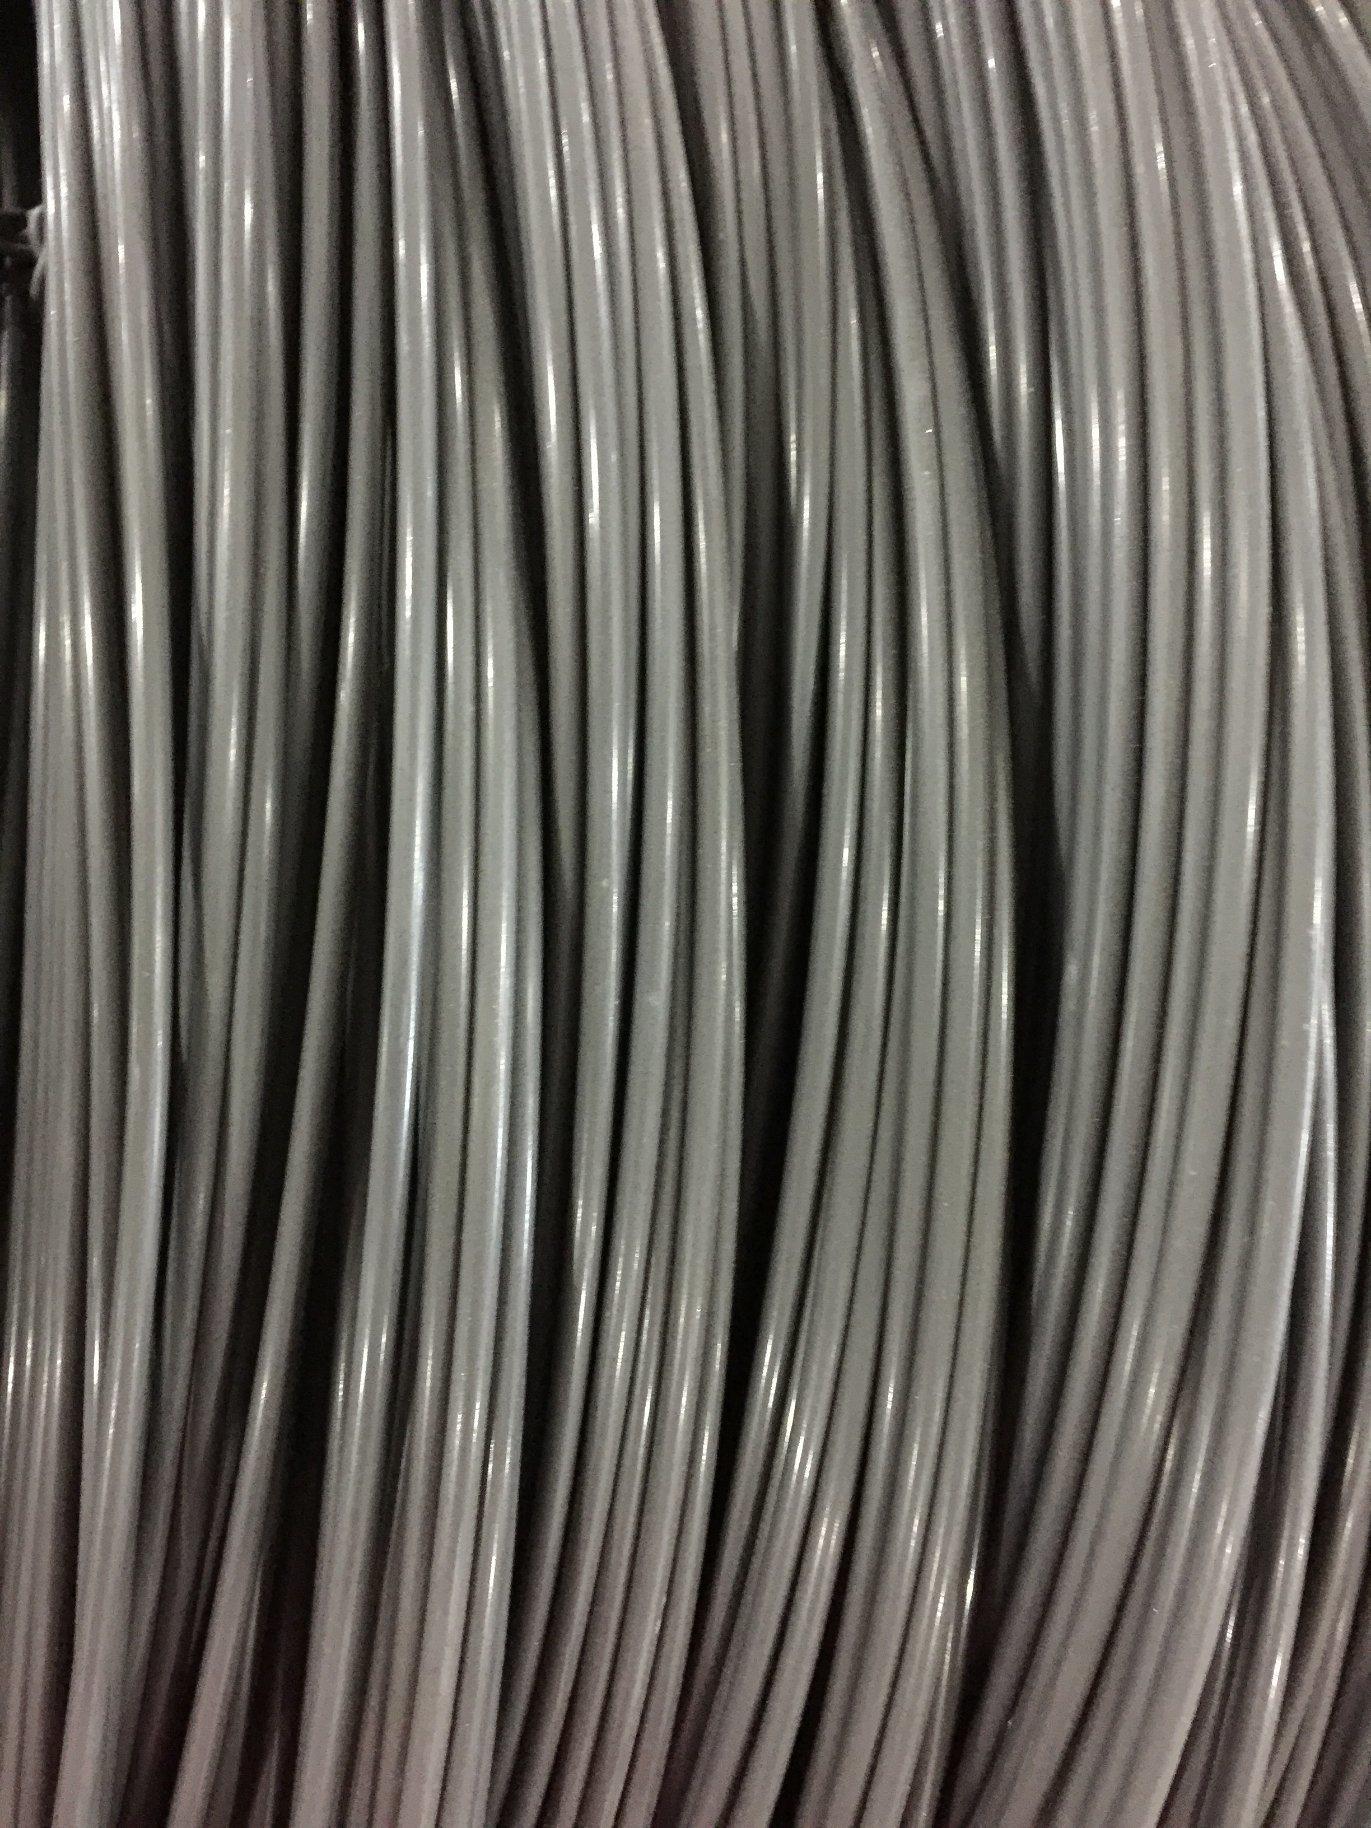 Chq Medium Carbon Steel Wire Swch45k for High Quality